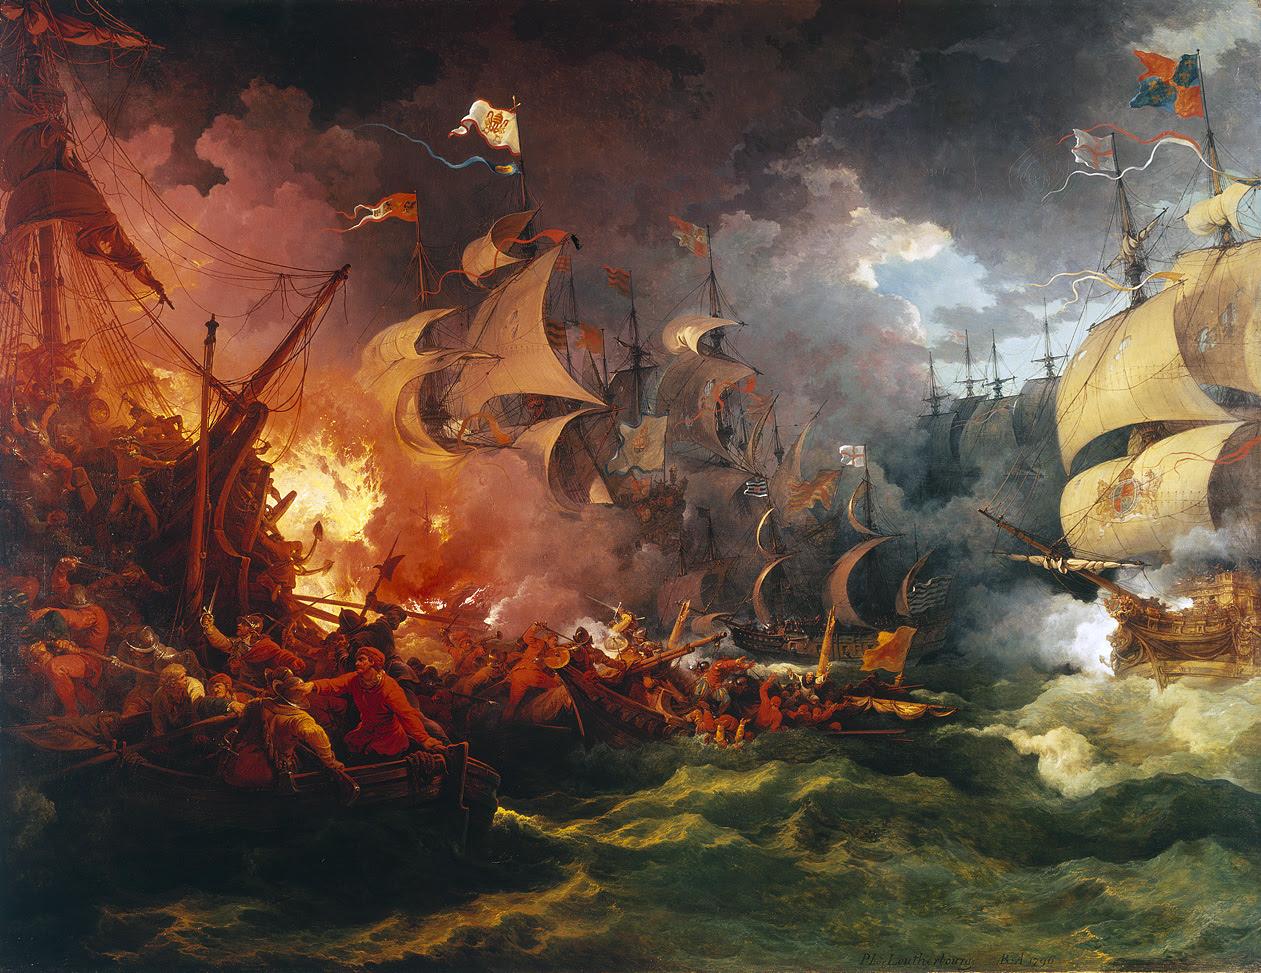 http://upload.wikimedia.org/wikipedia/commons/c/cc/Spanish_Armada.jpg